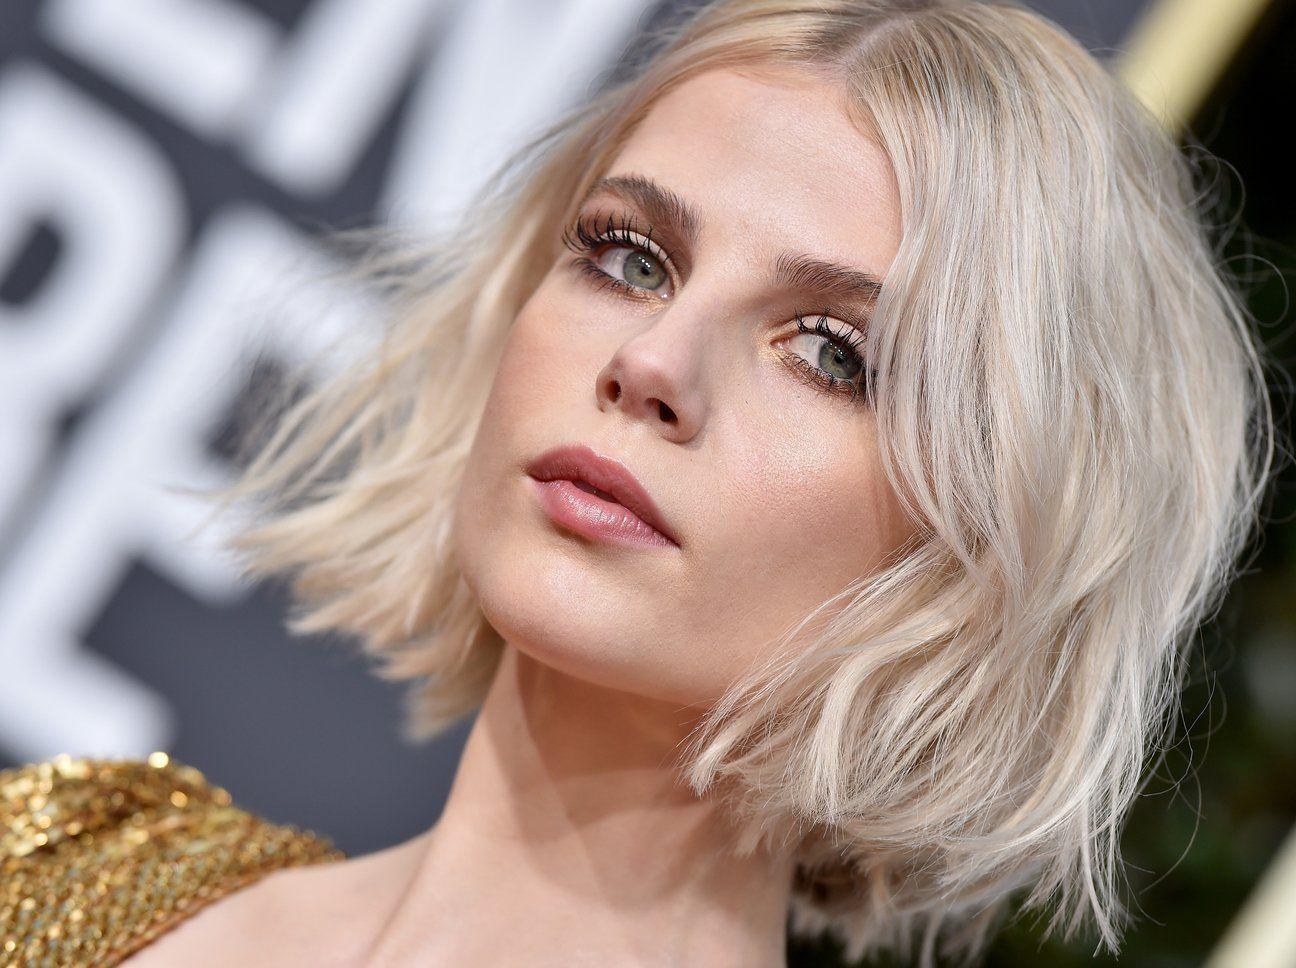 Trendfrisur Alle Tragen Jetzt Den Petit Bob Elle Trendfrisuren Bob Frisur Haare Blond Farben